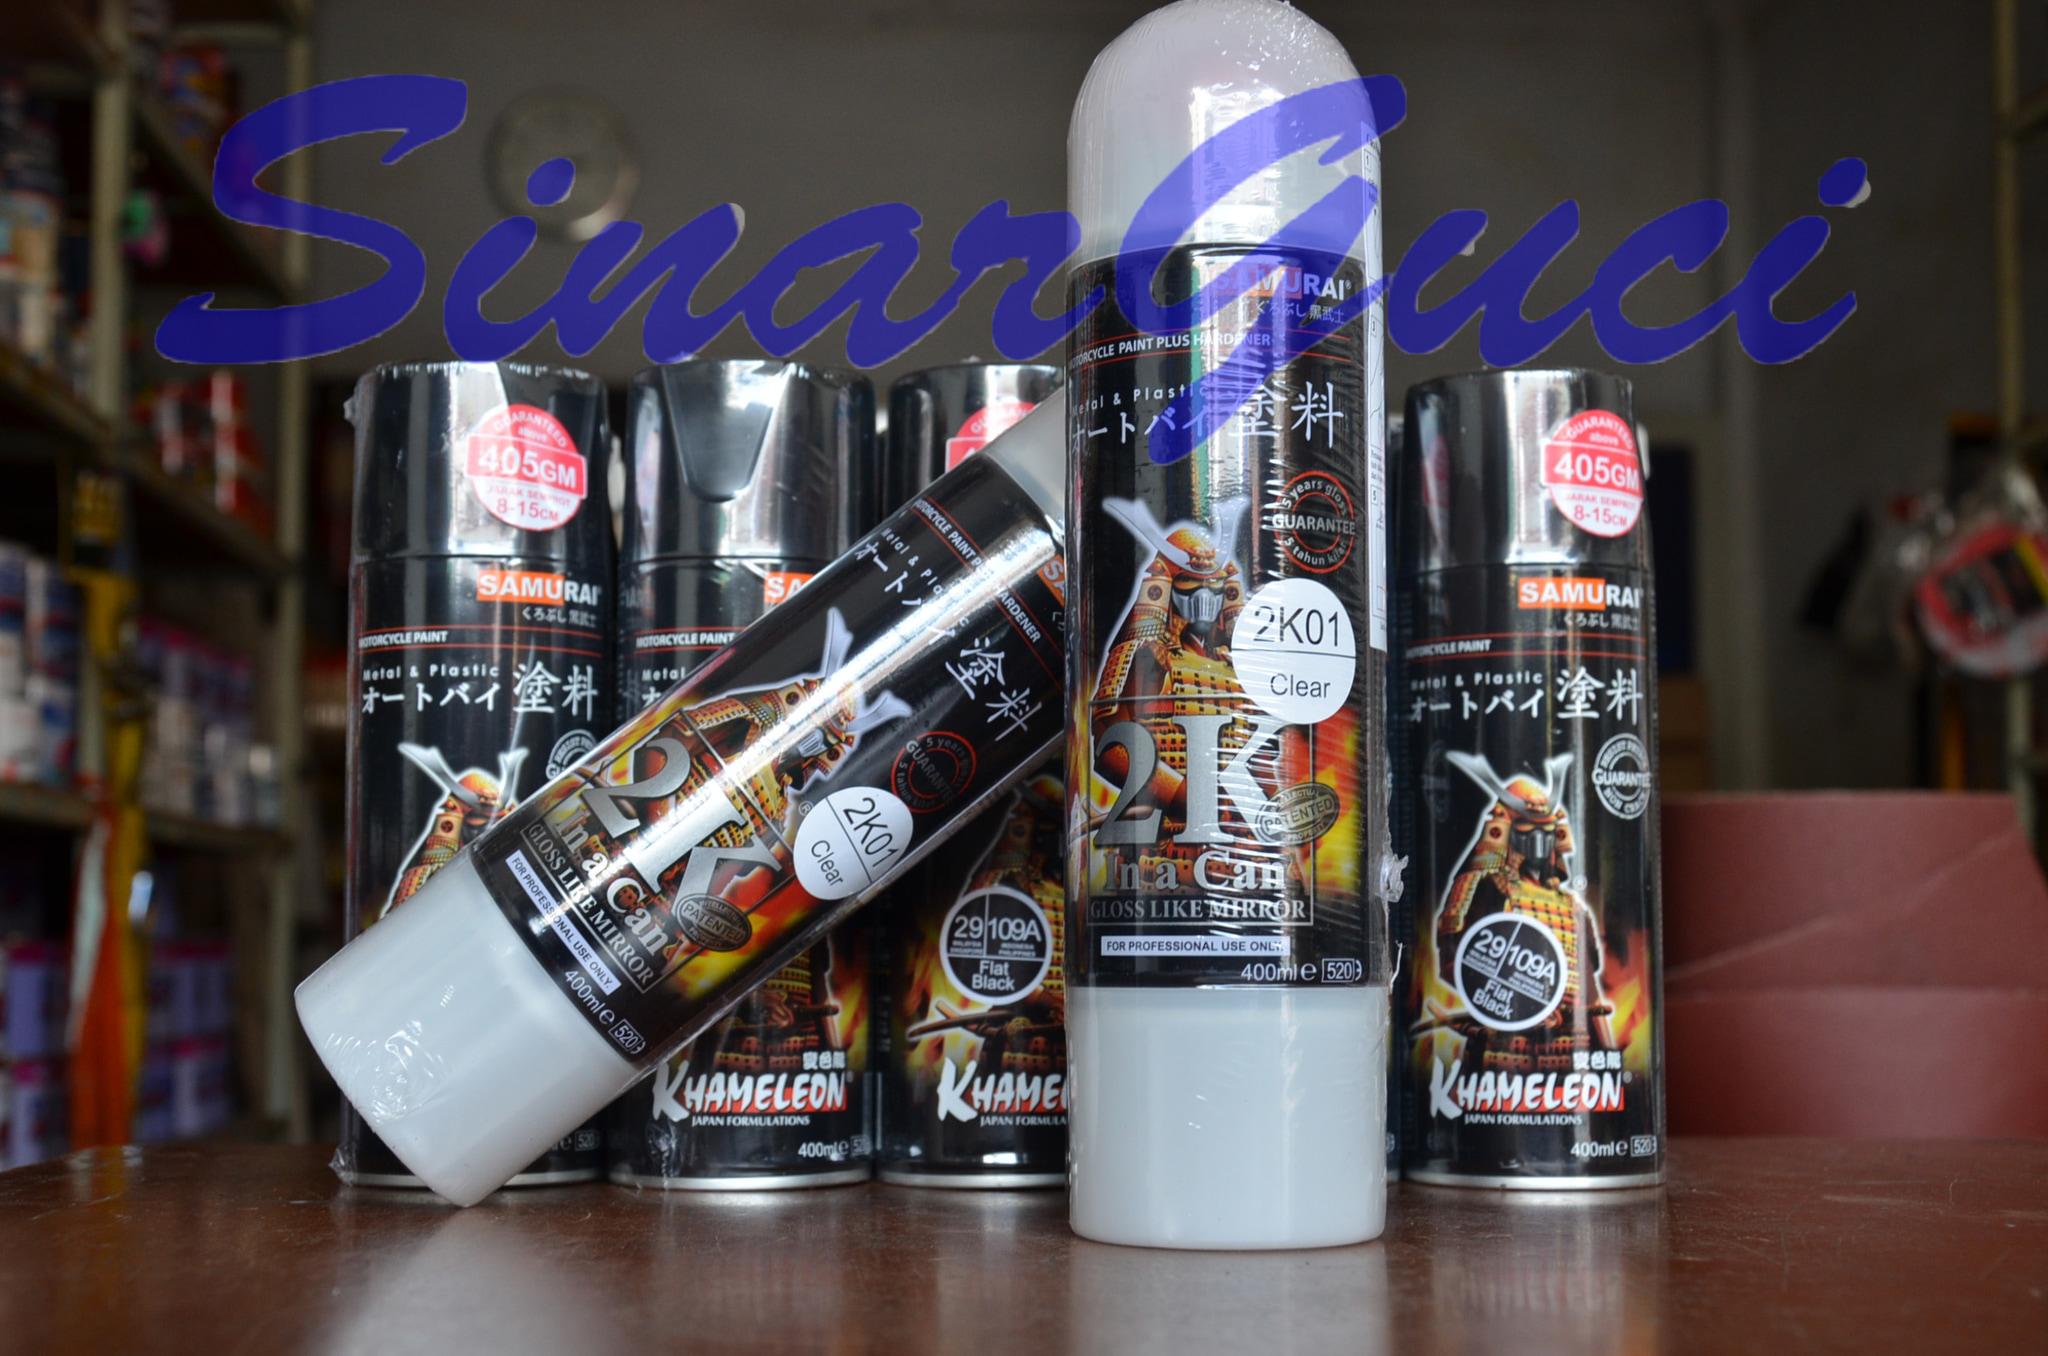 Jual Cat Semprot Samurai Pilox Pylox Paint Spray Pernis Clear 2k Can Gun Aerosol Sinar Guci Tokopedia